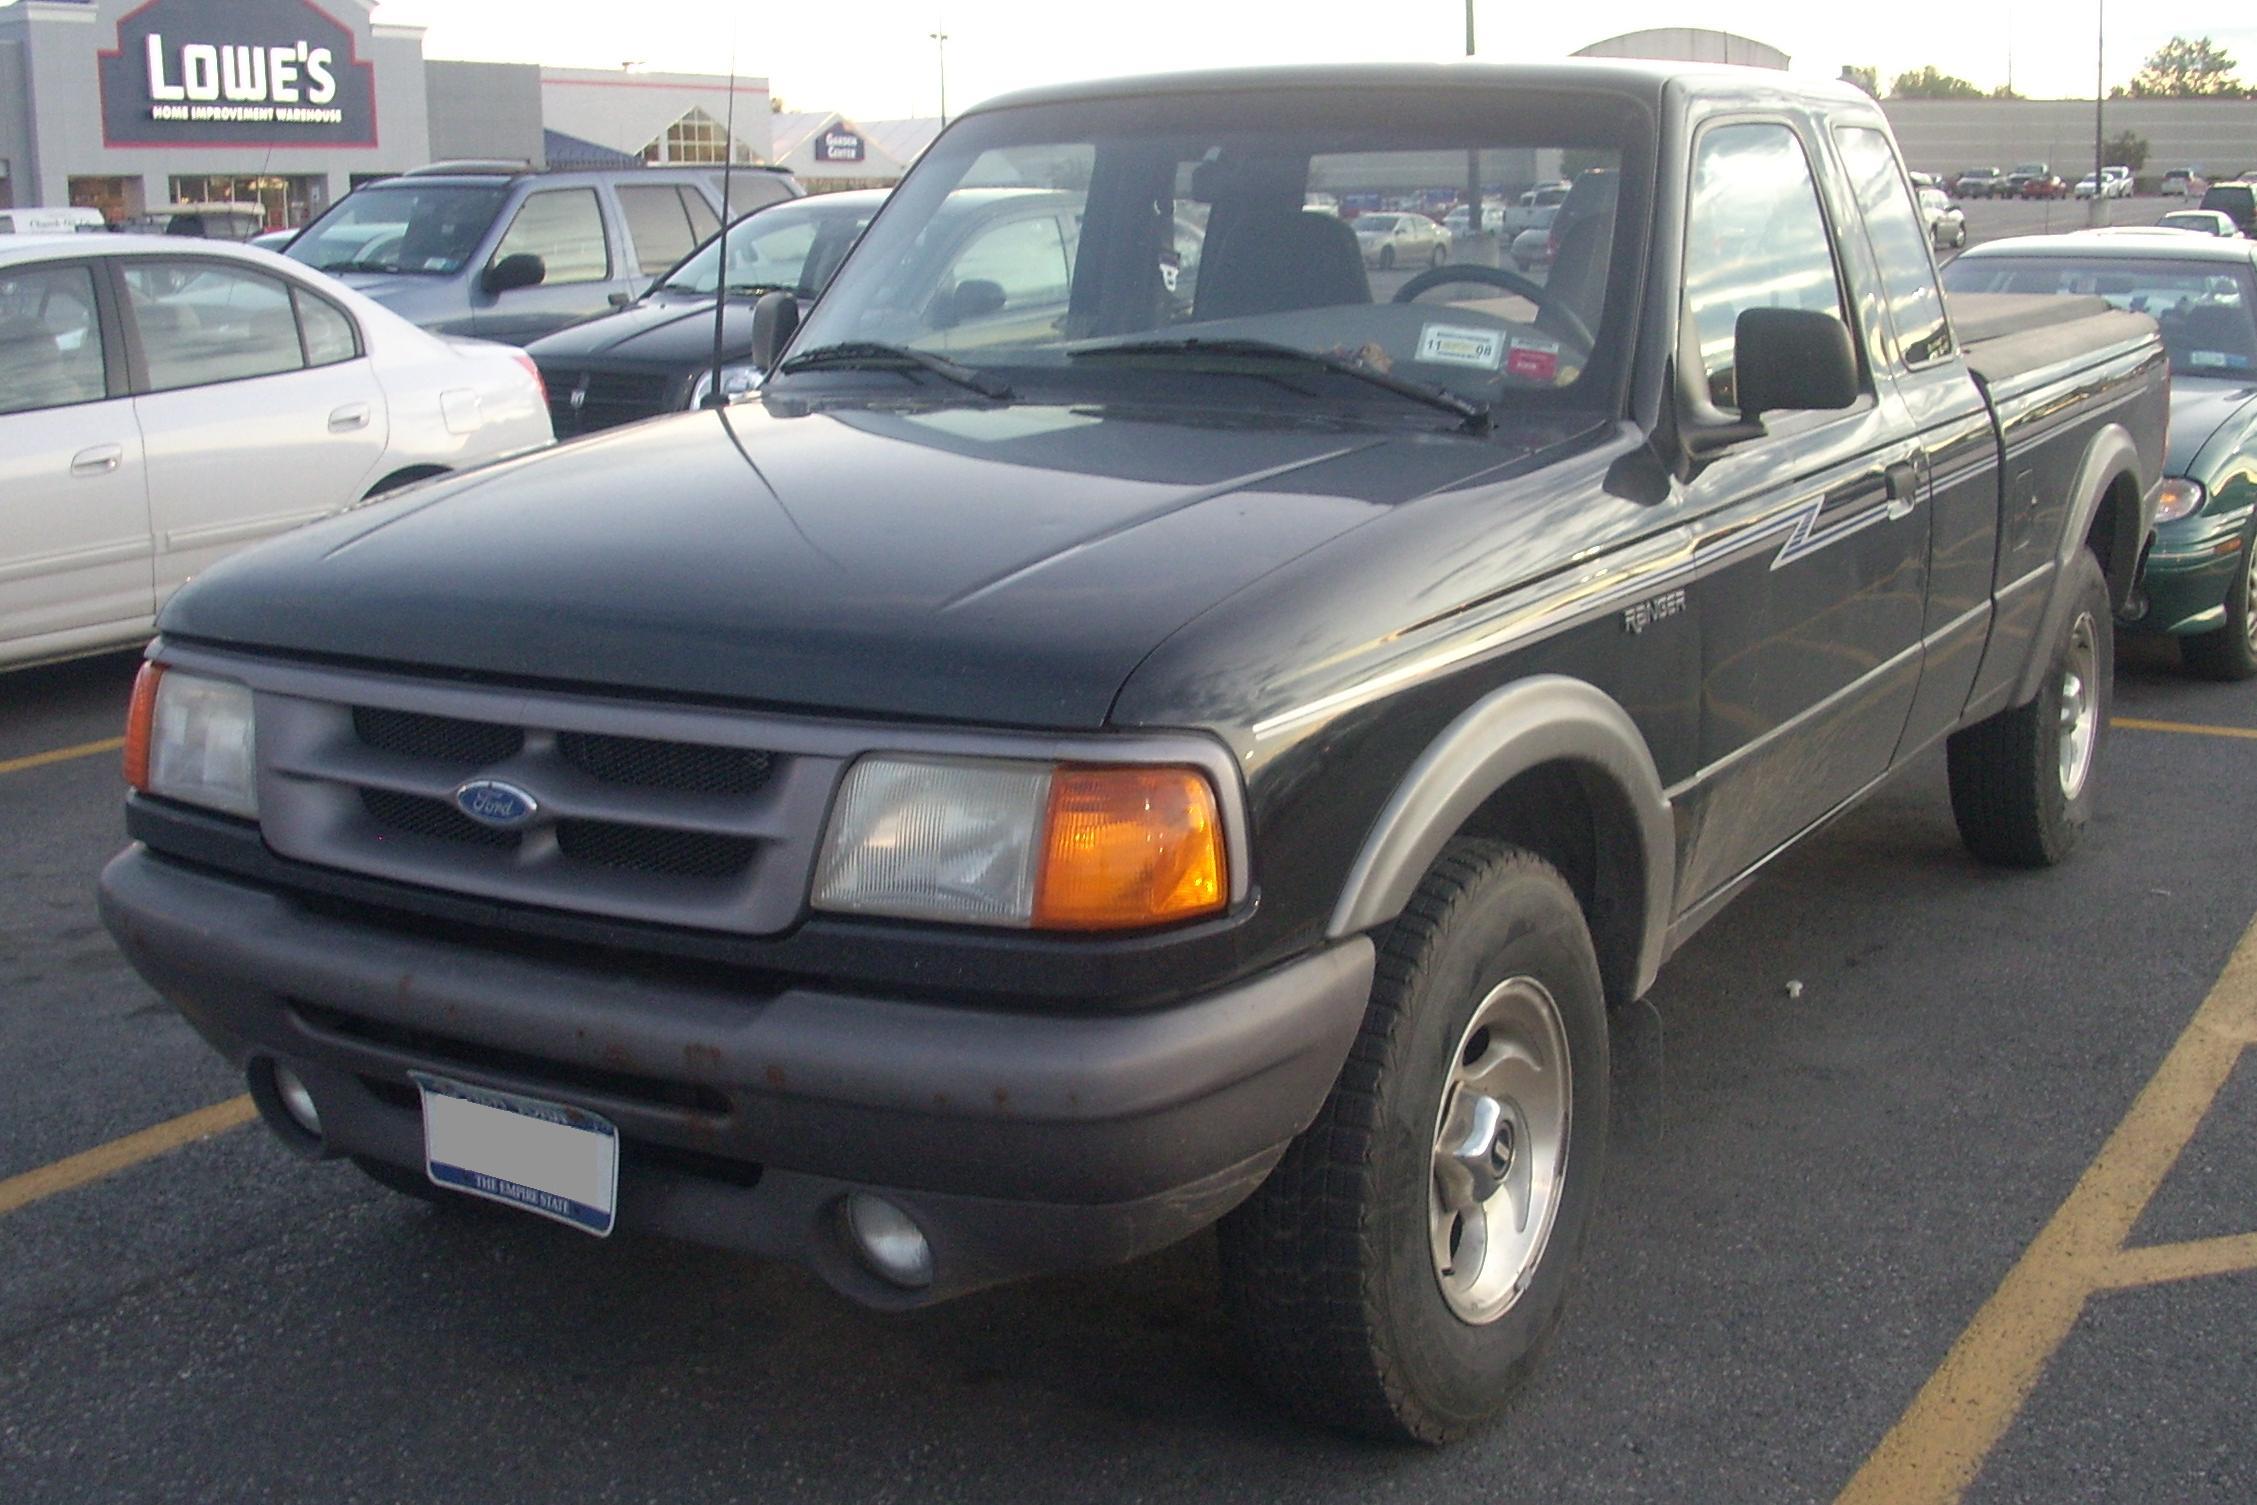 New Ford Ranger Usa >> File:'95-'97 Ford Ranger Ext. Cab.JPG - Wikimedia Commons